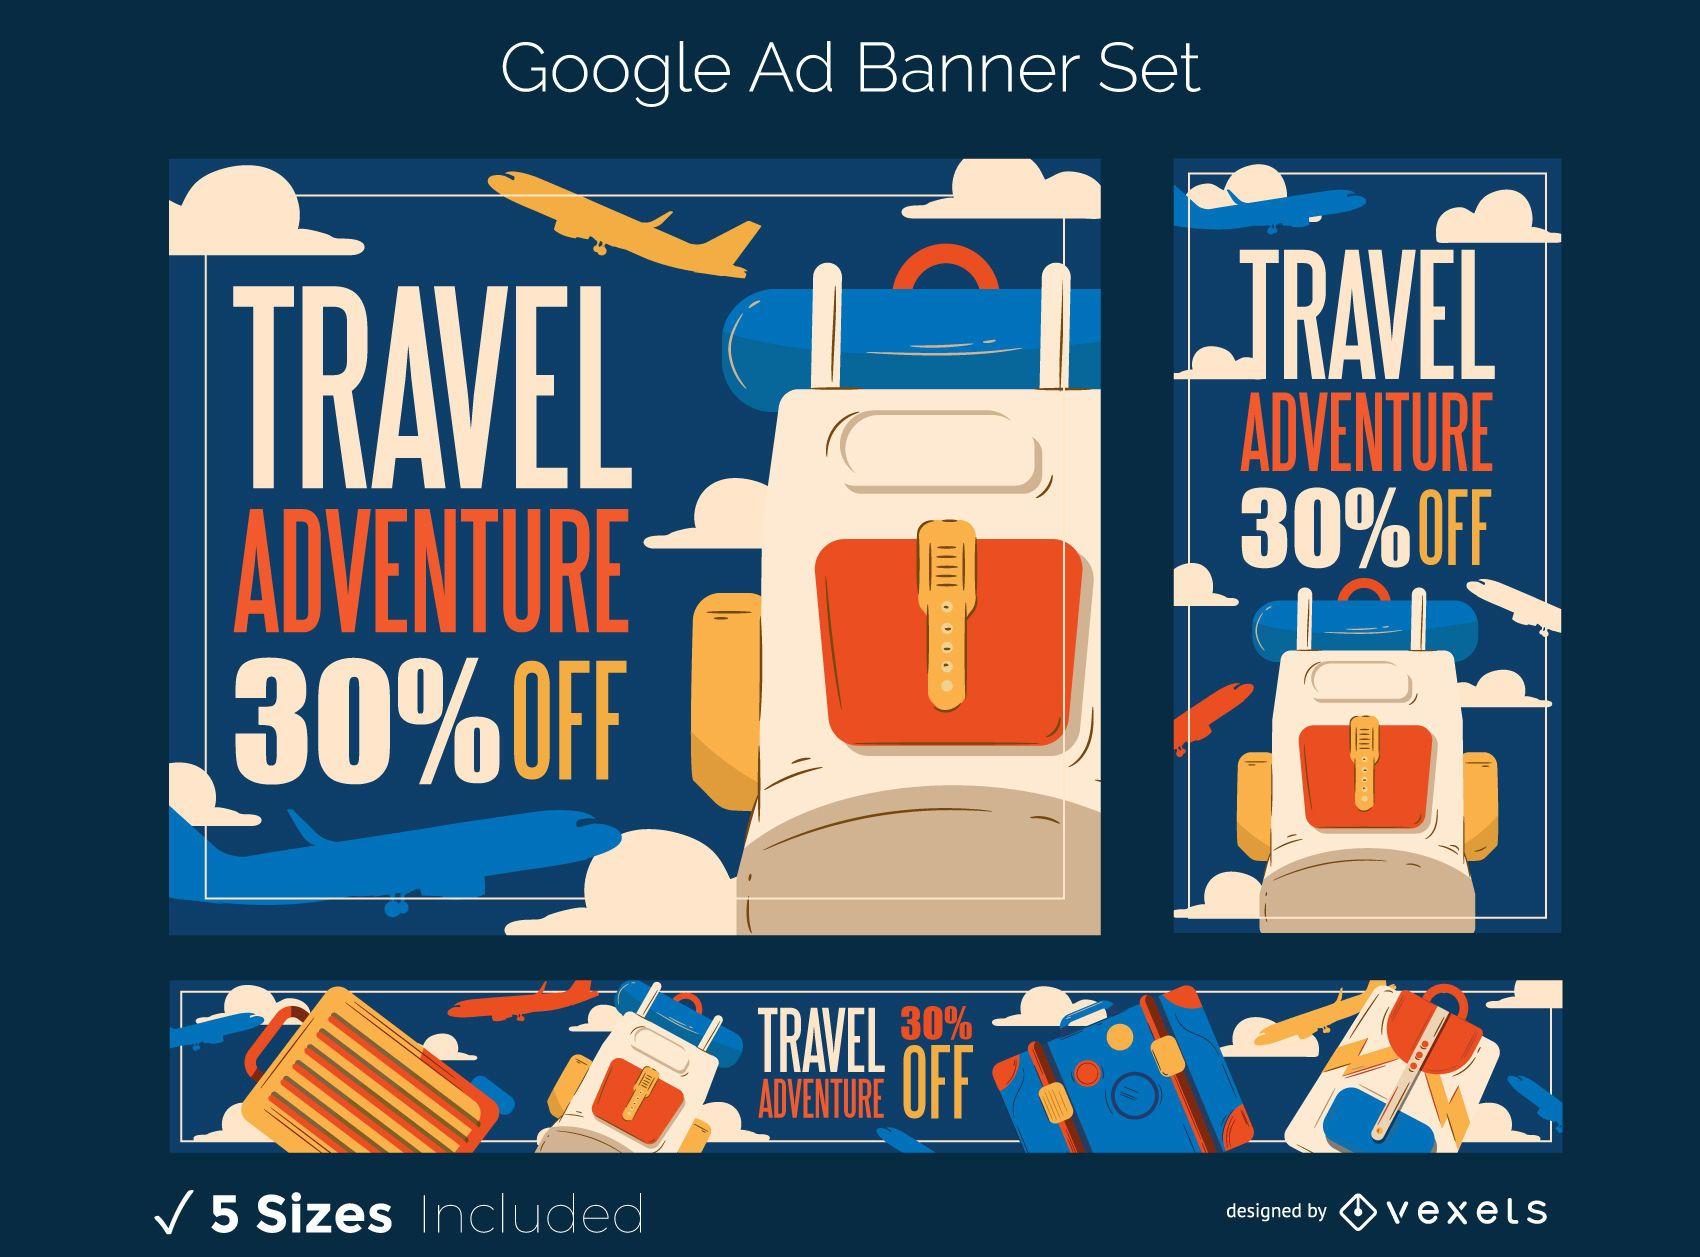 Travel adventure banner set